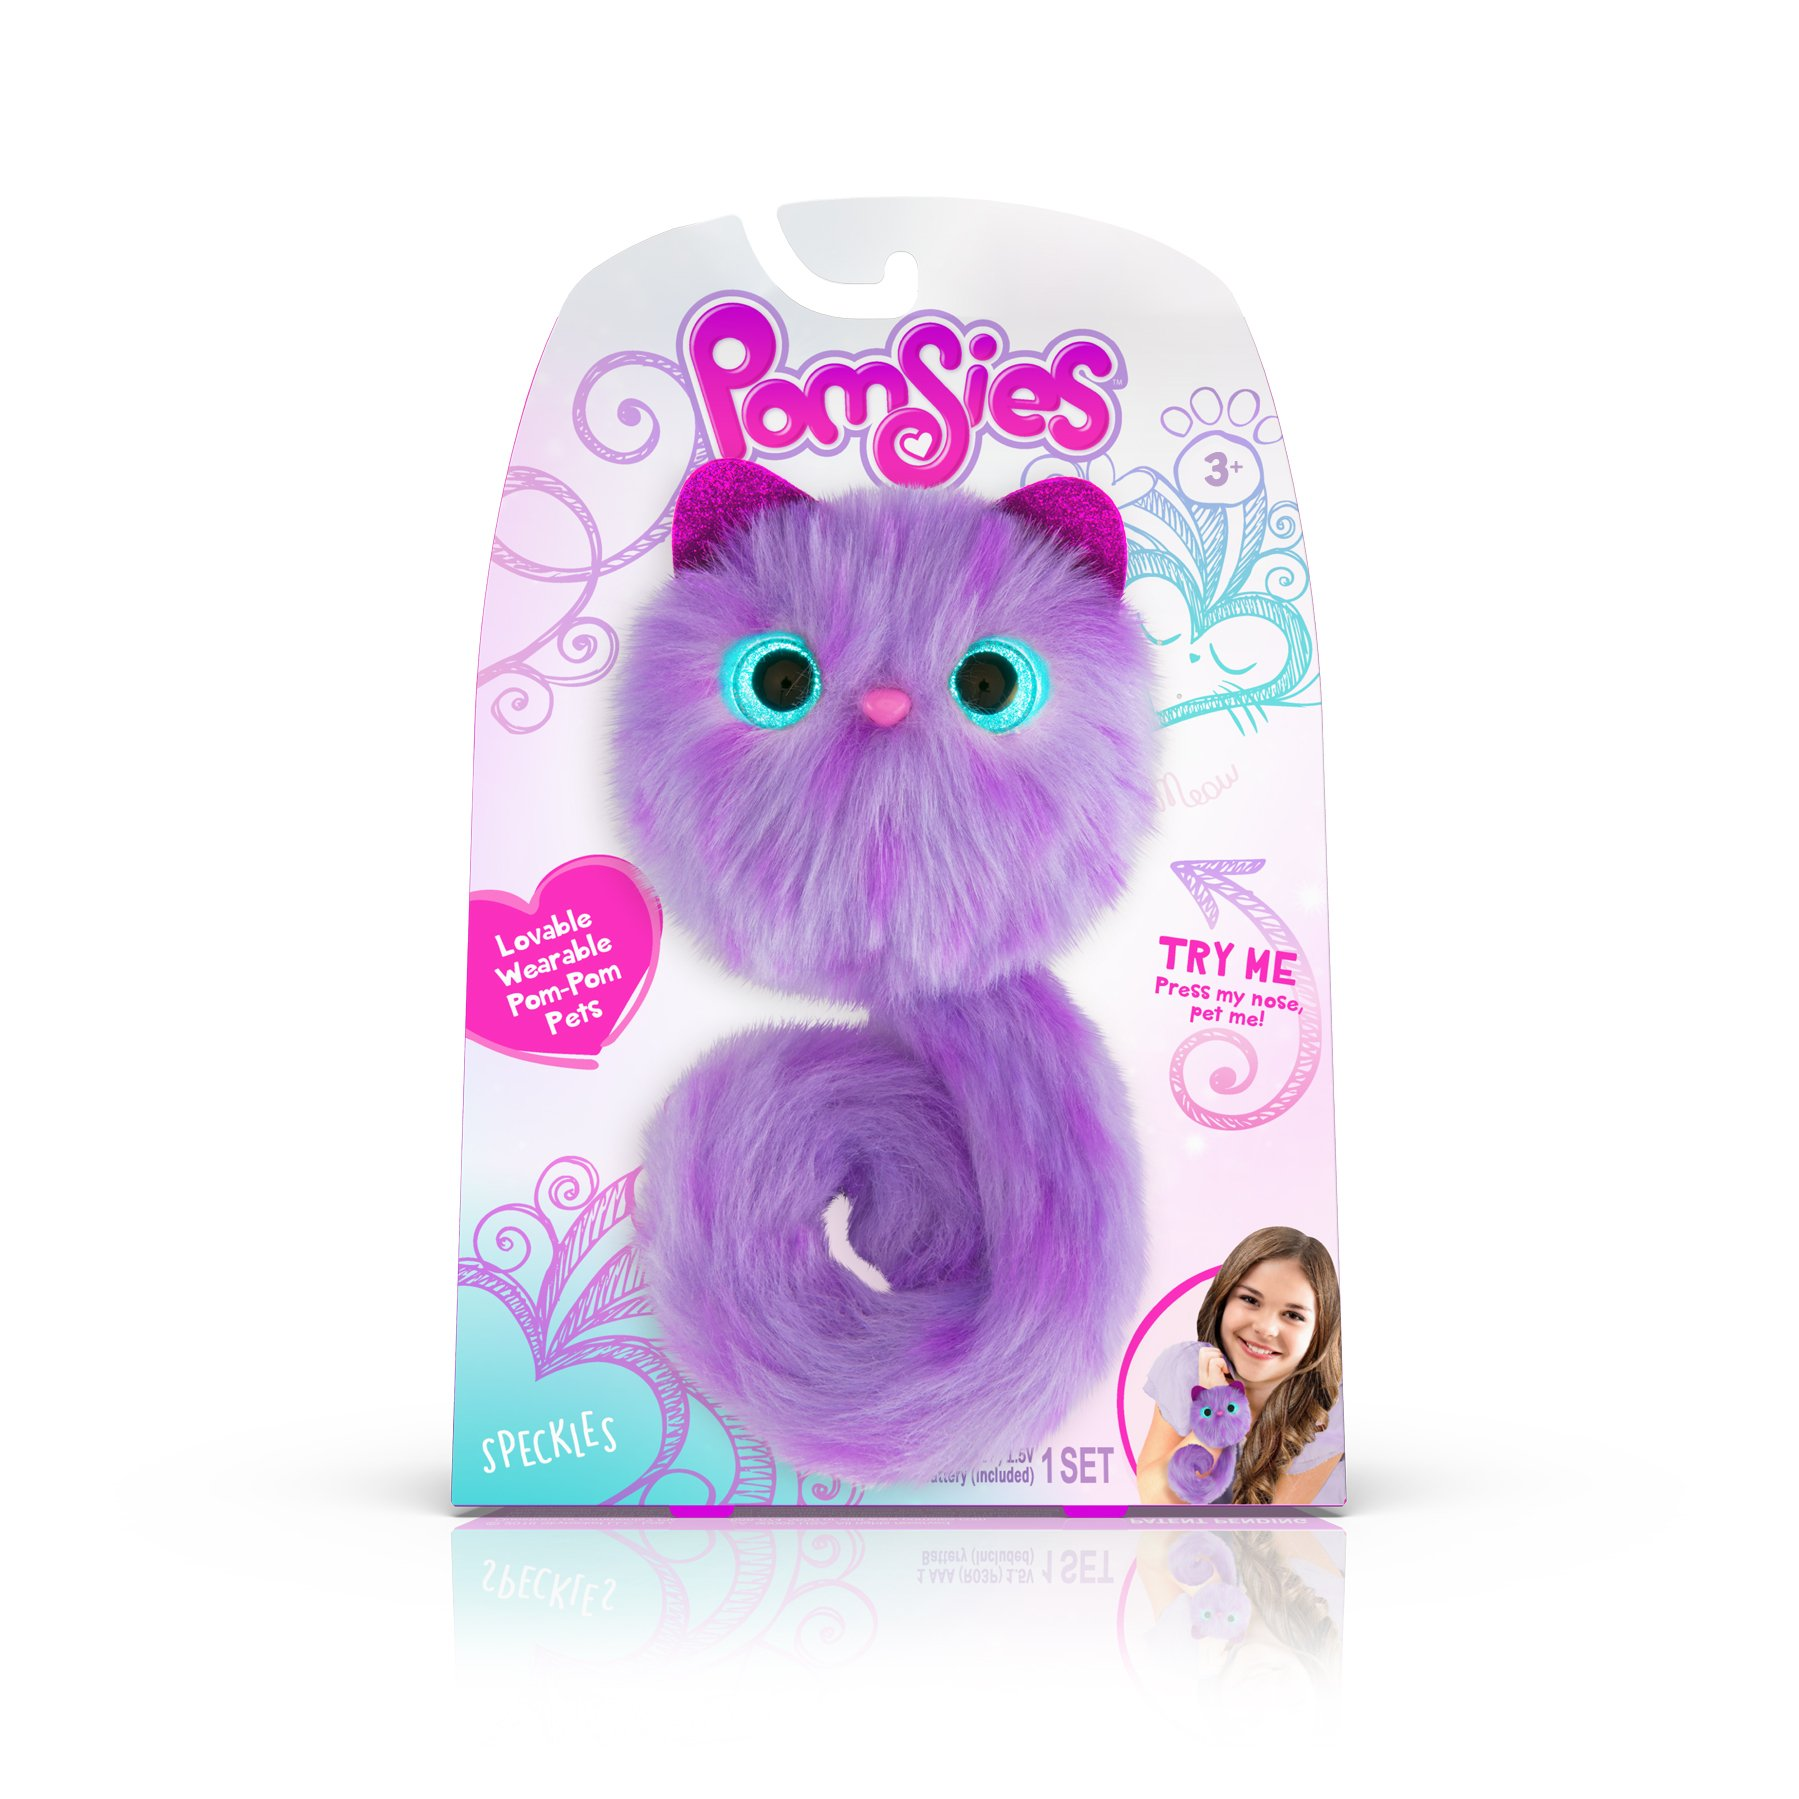 Pomsies Speckles Plush Interactive Toys, Purple/Lavender